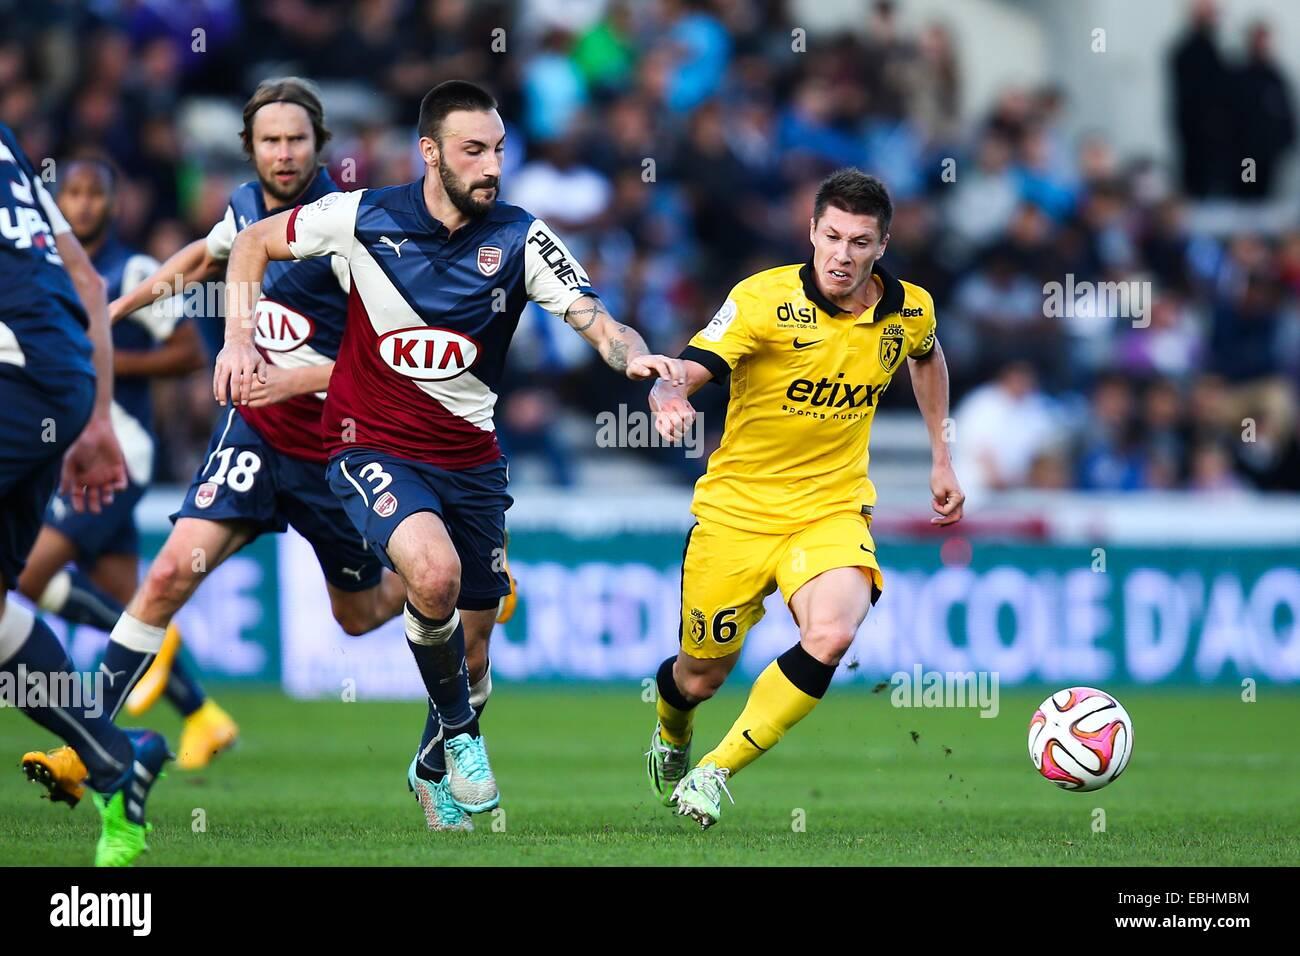 Diego Contento/Jonathan Deplace - 30.11.2014 - Bordeaux/Lille - 15eme journee de Ligue 1 Photo : Manuel Blondau/Icona Immagini Stock